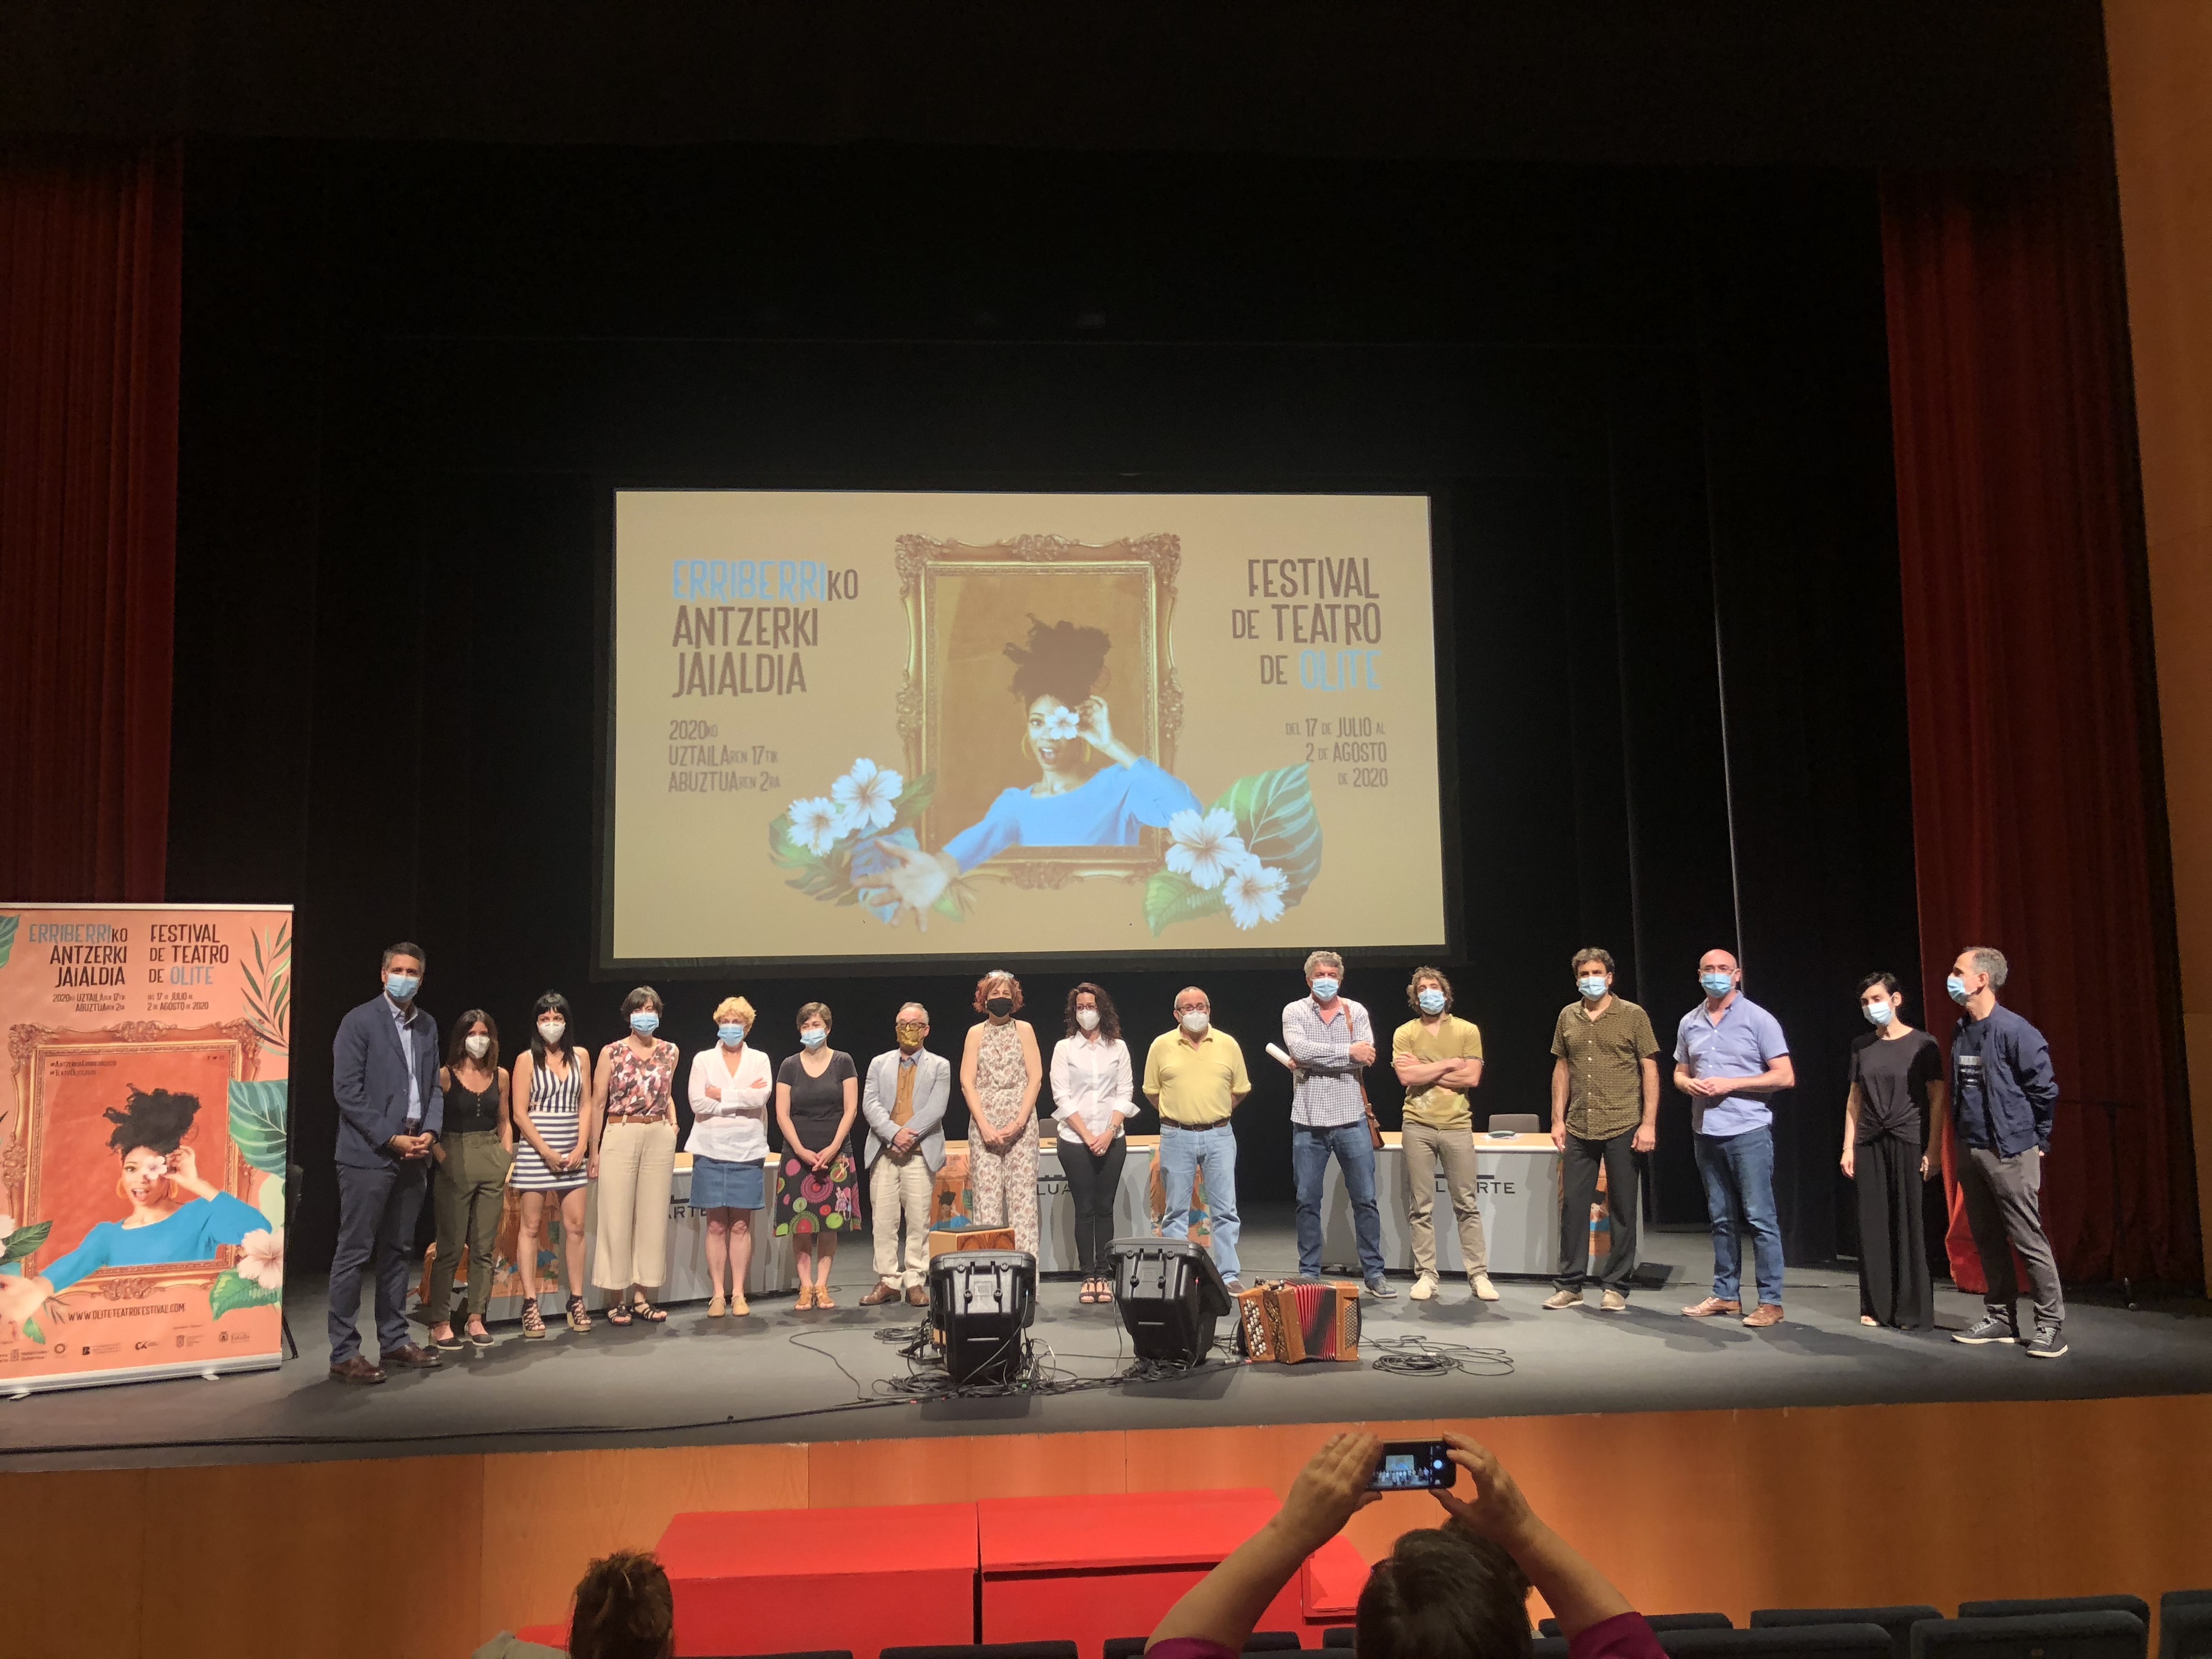 Olite.Presentado el Festival de Teatro de Olite